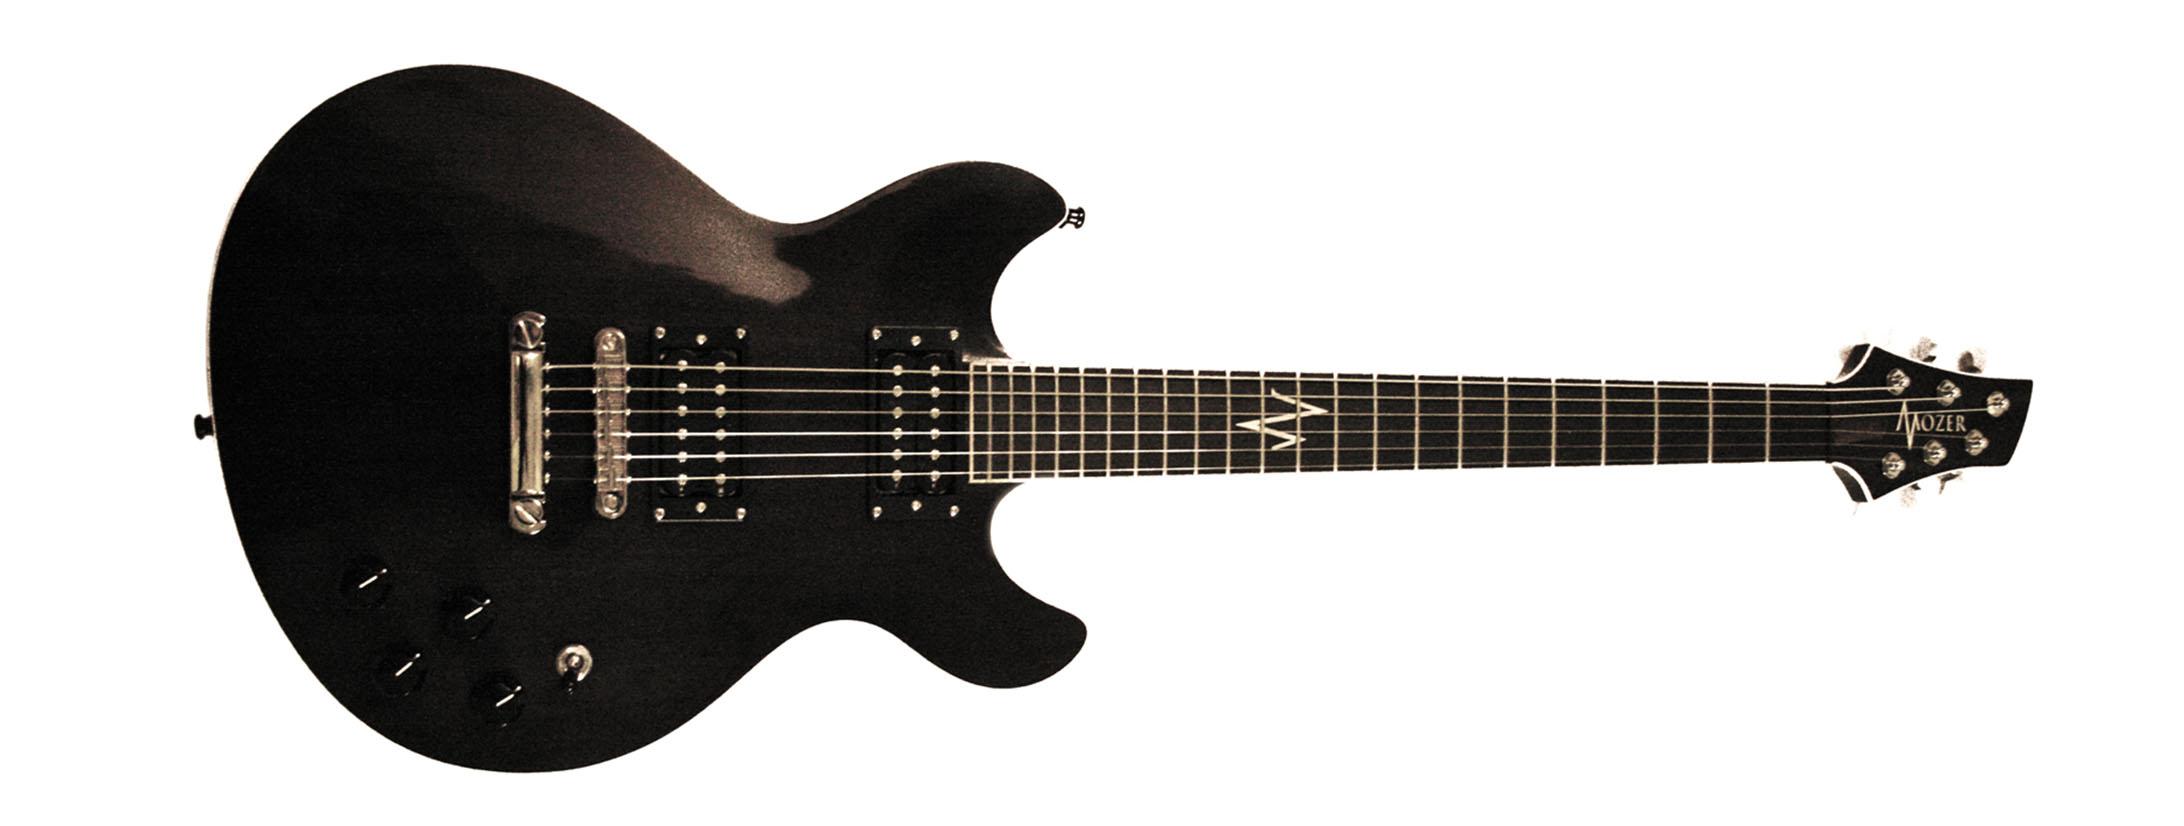 Mozer custom guitar Bill Kelliher